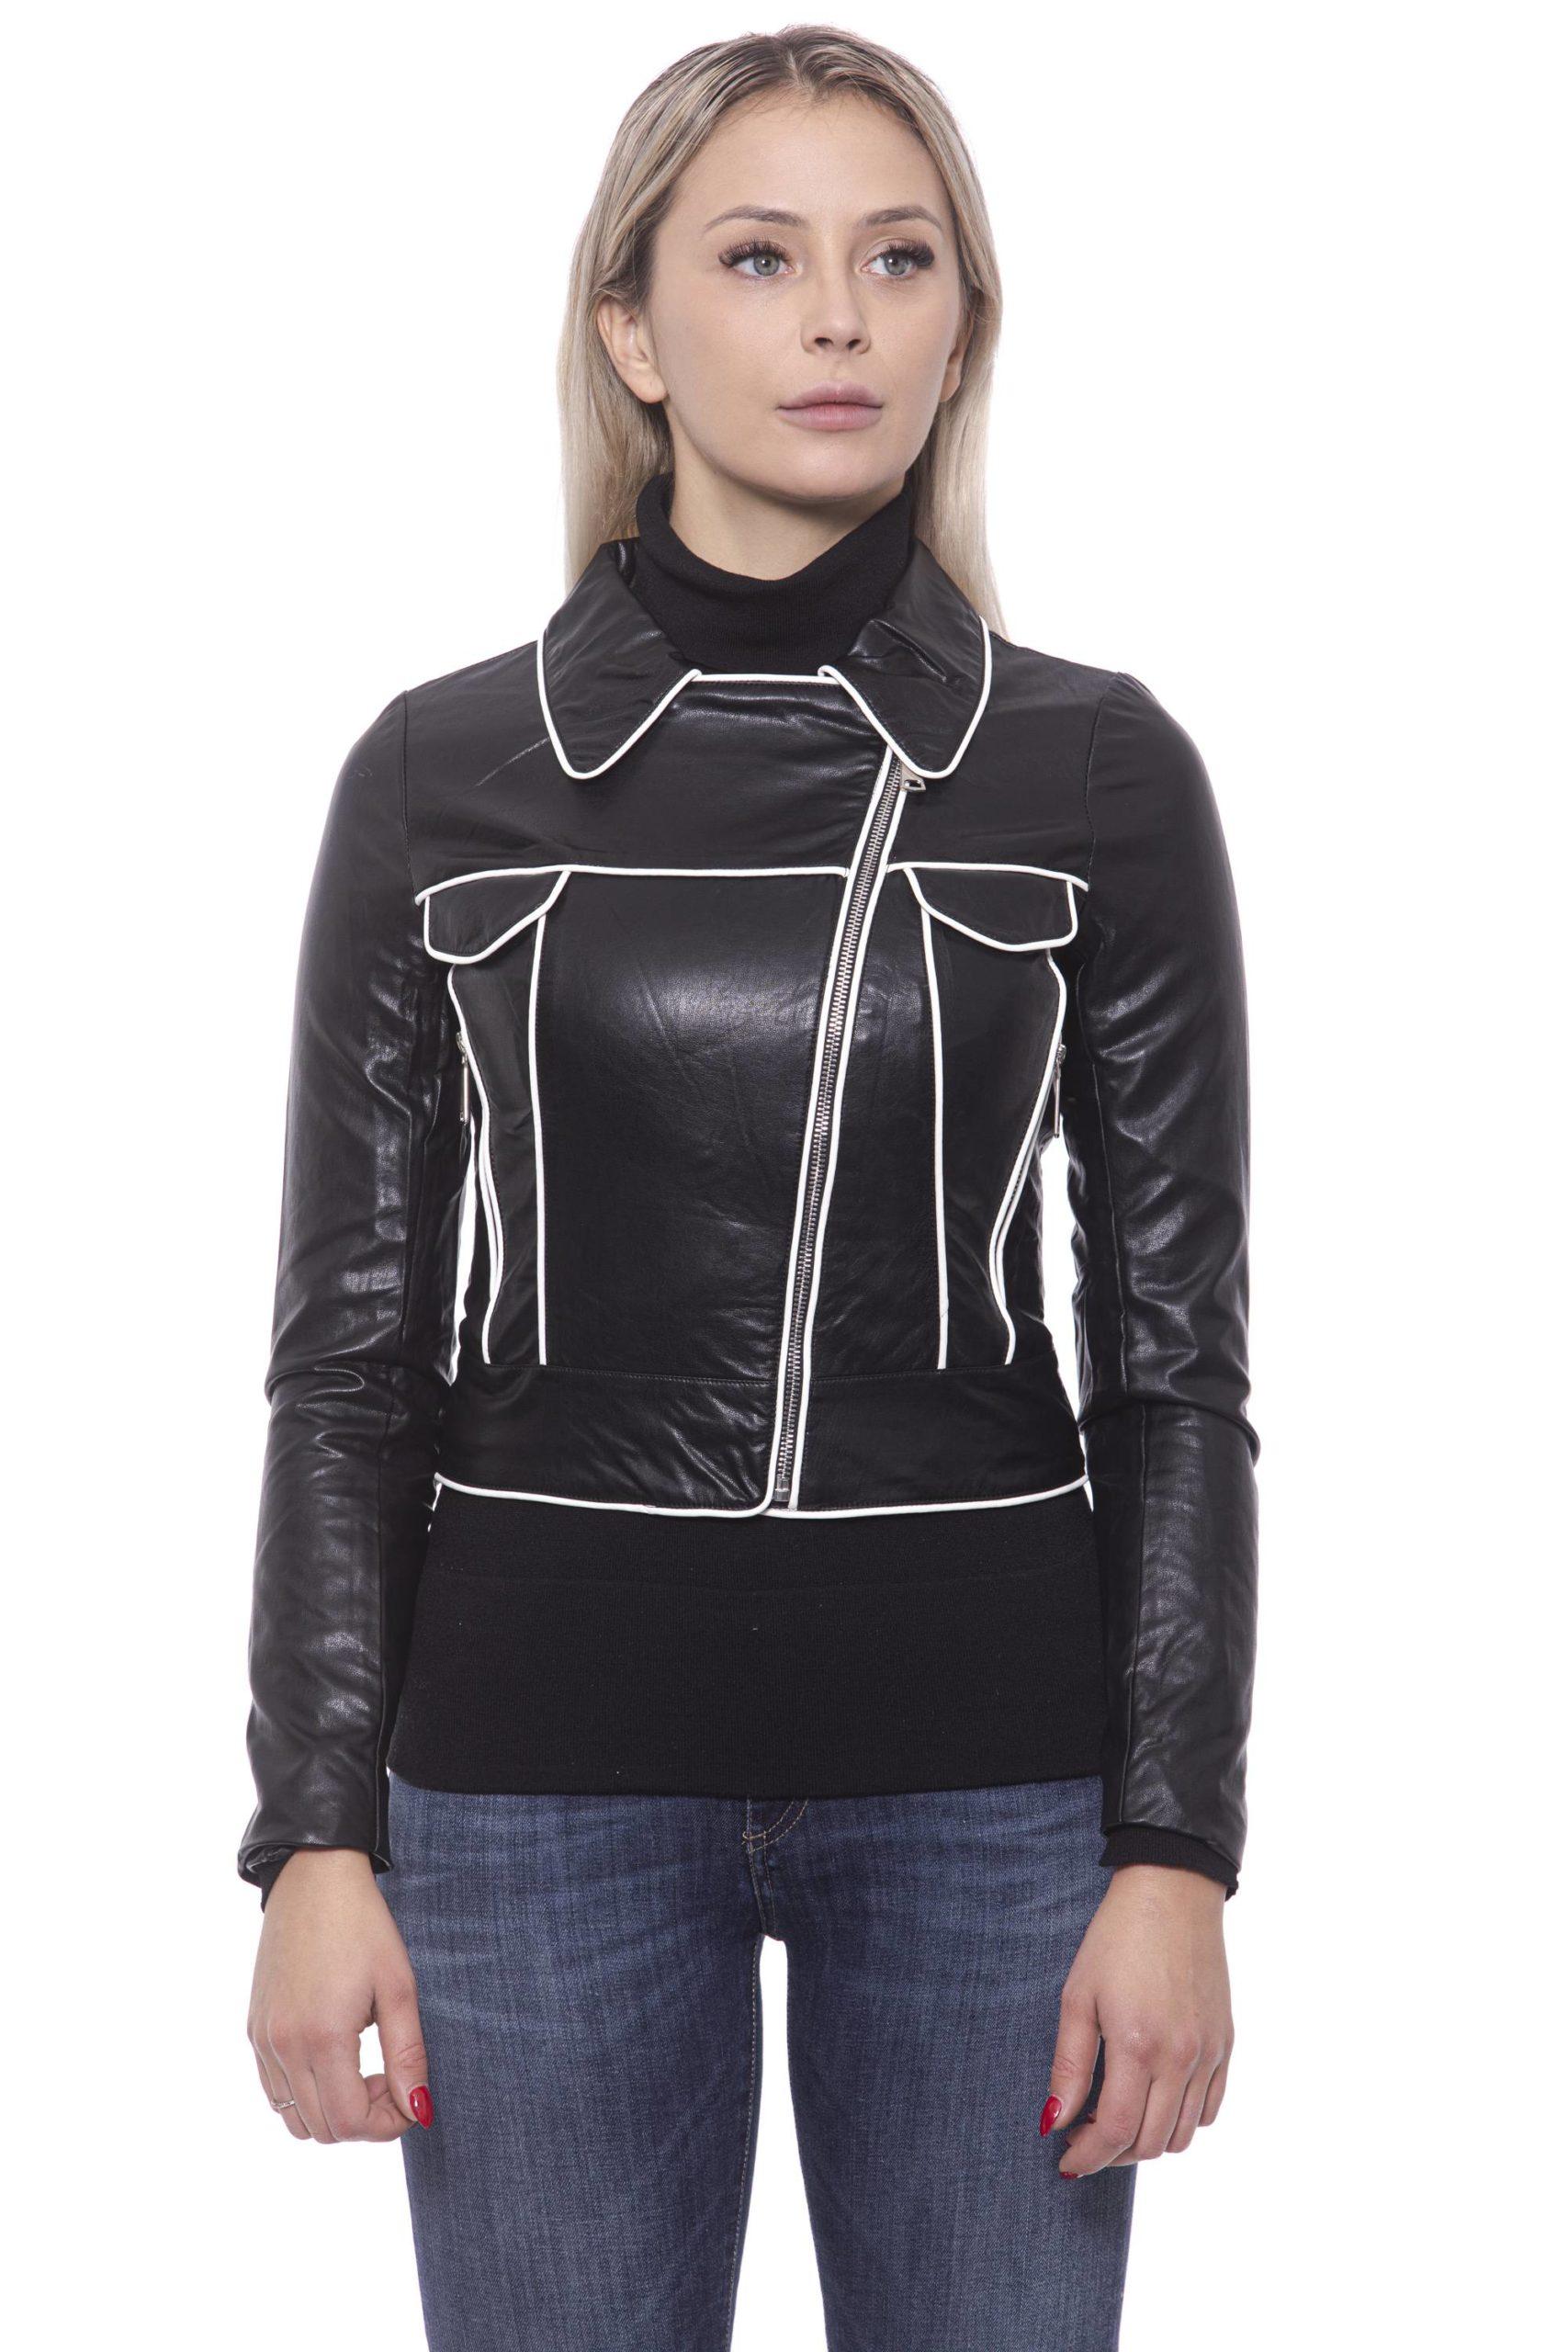 19V69 Italia Women's Nero Jacket 191388428 - IT42   S